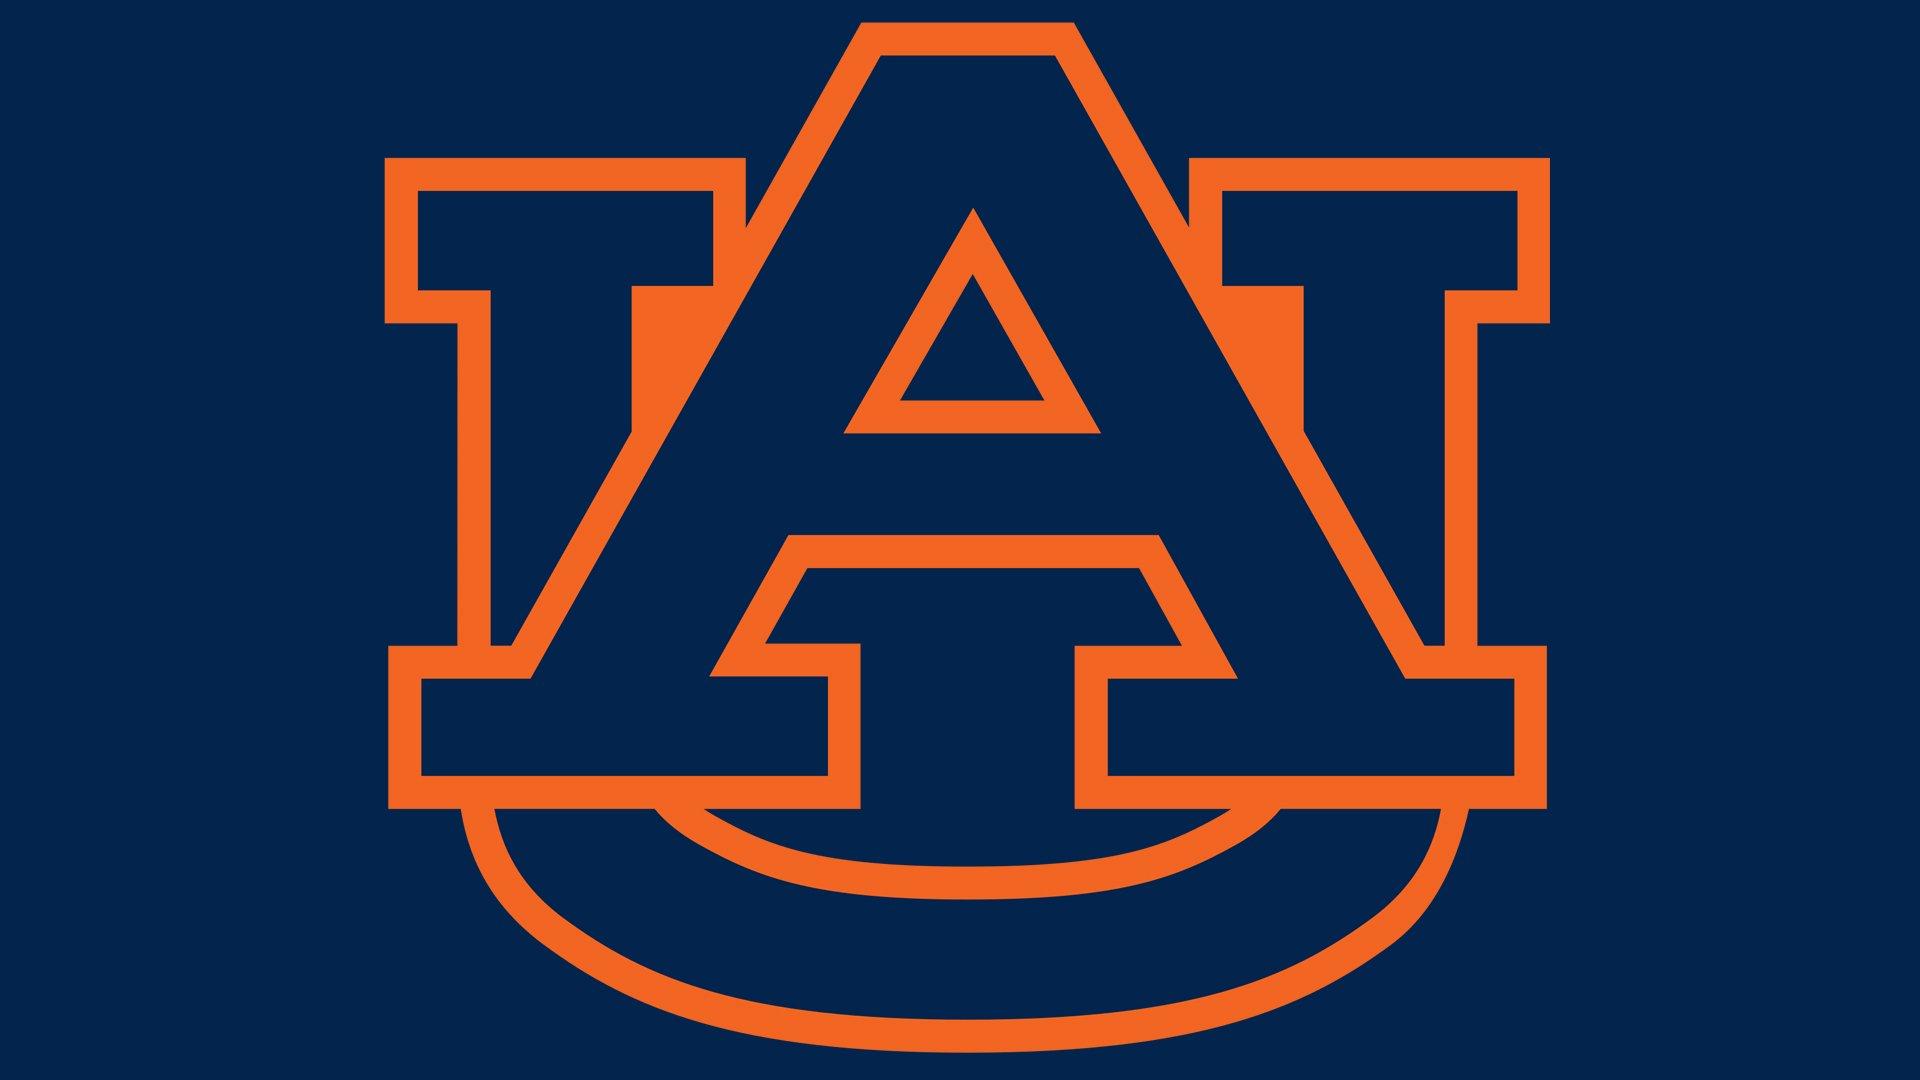 auburn university logo  auburn university symbol  meaning Auburn Tigers Logo Black and White Auburn Tigers Logo Wallpaper